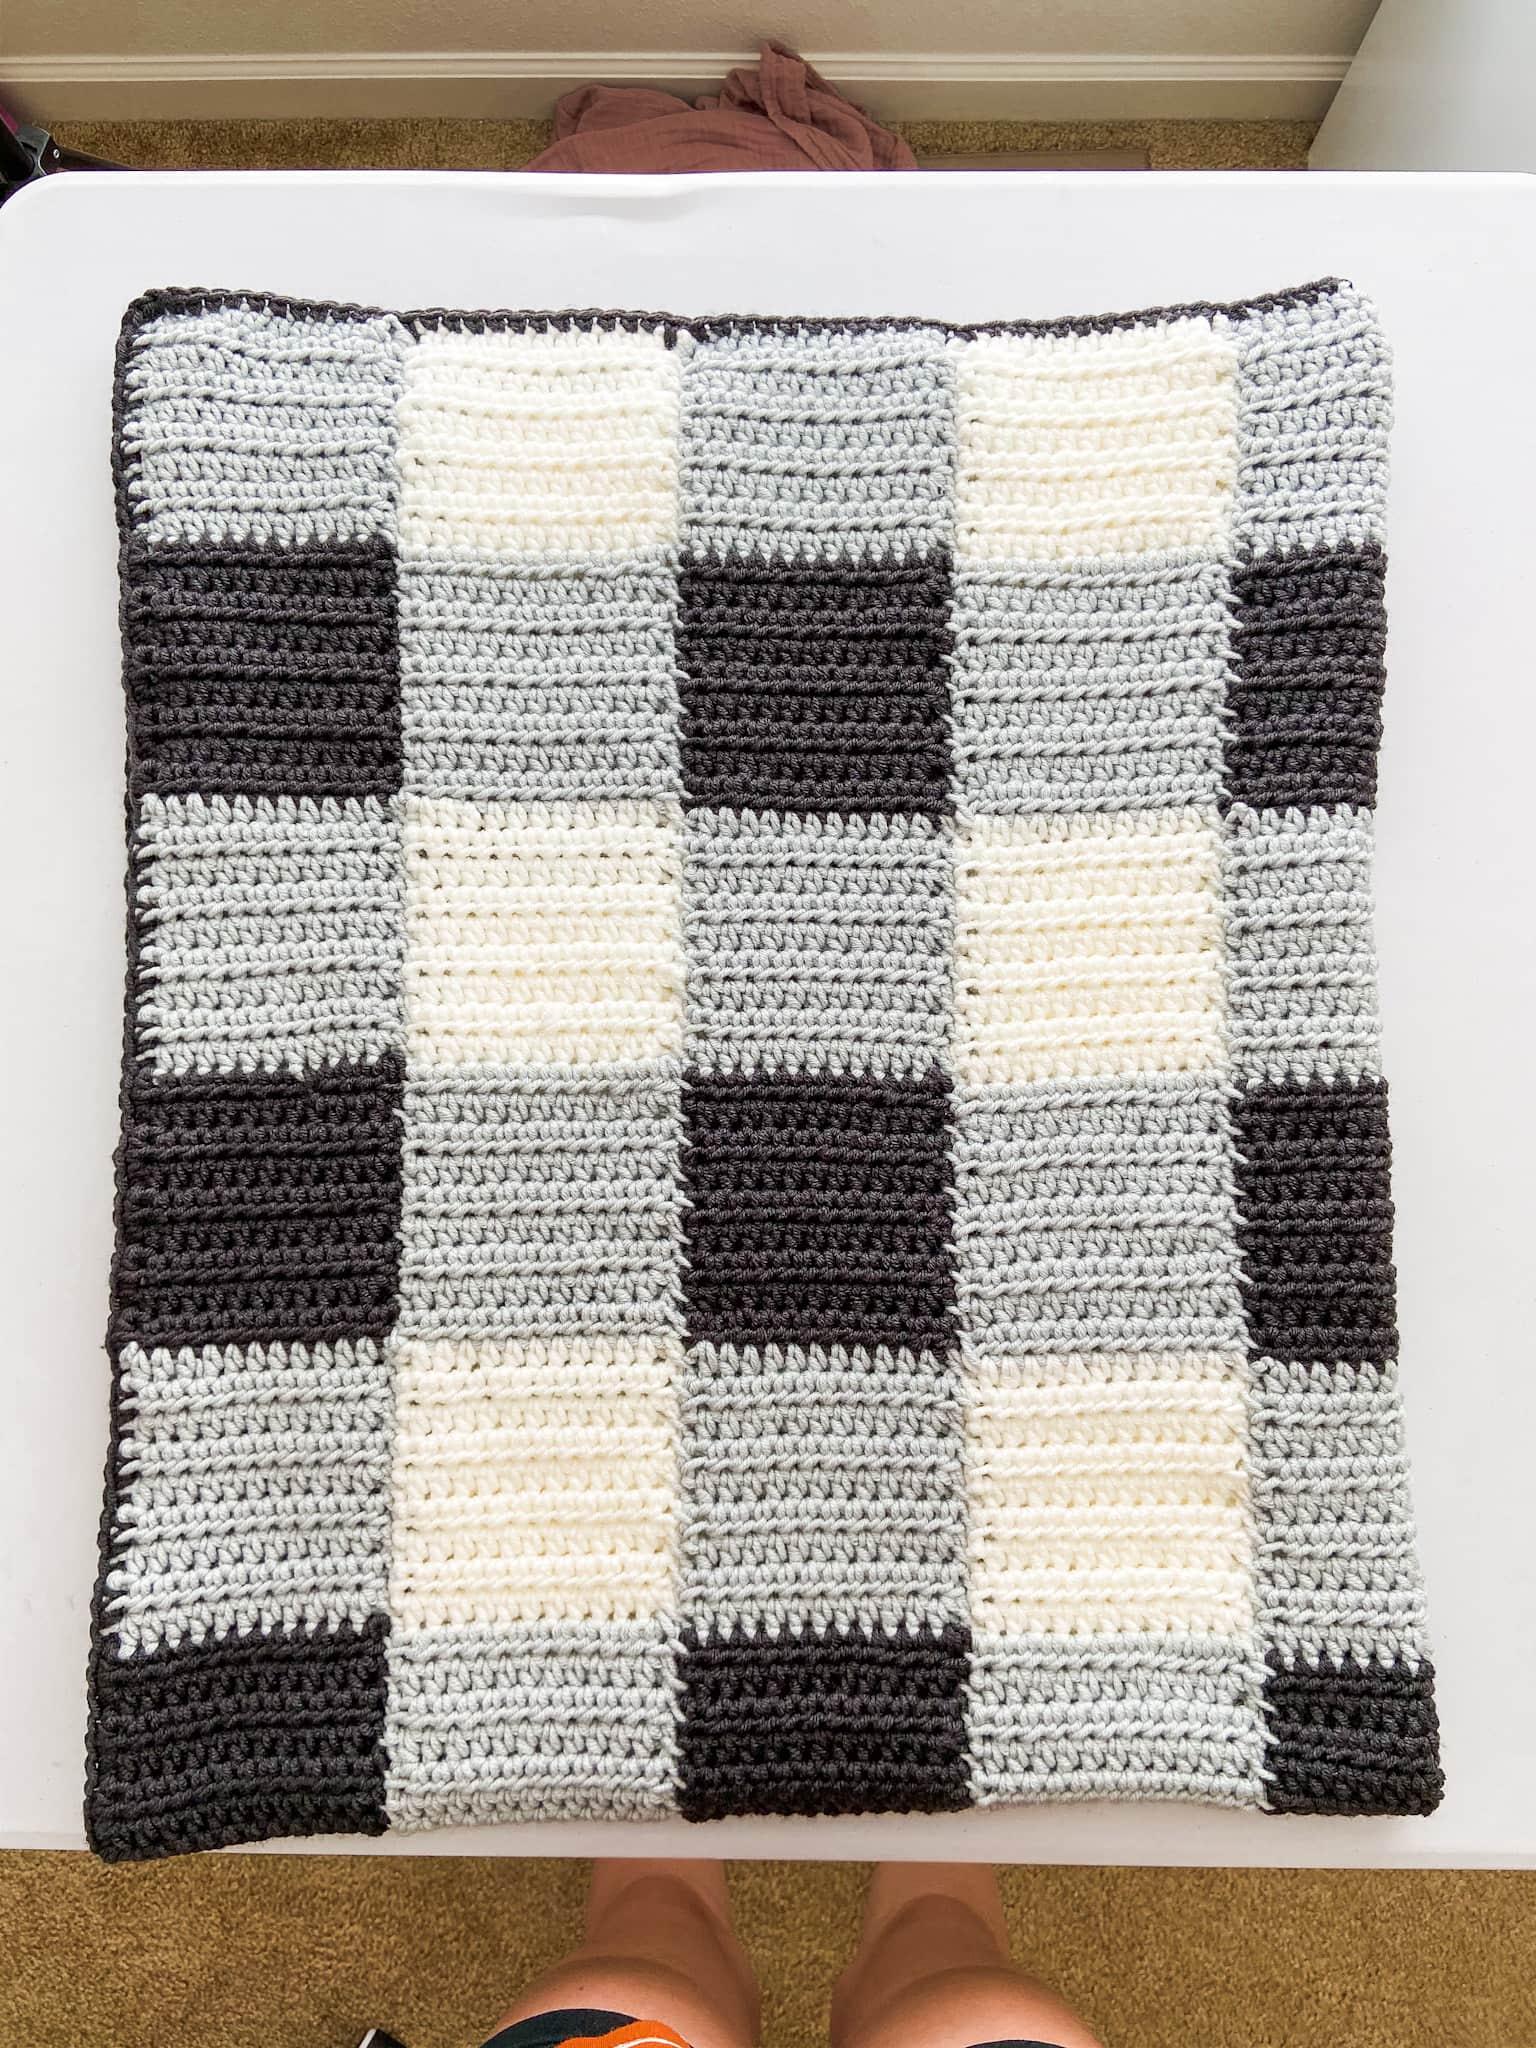 Cheaters Gingham Blanket Crochet Along – Week 4